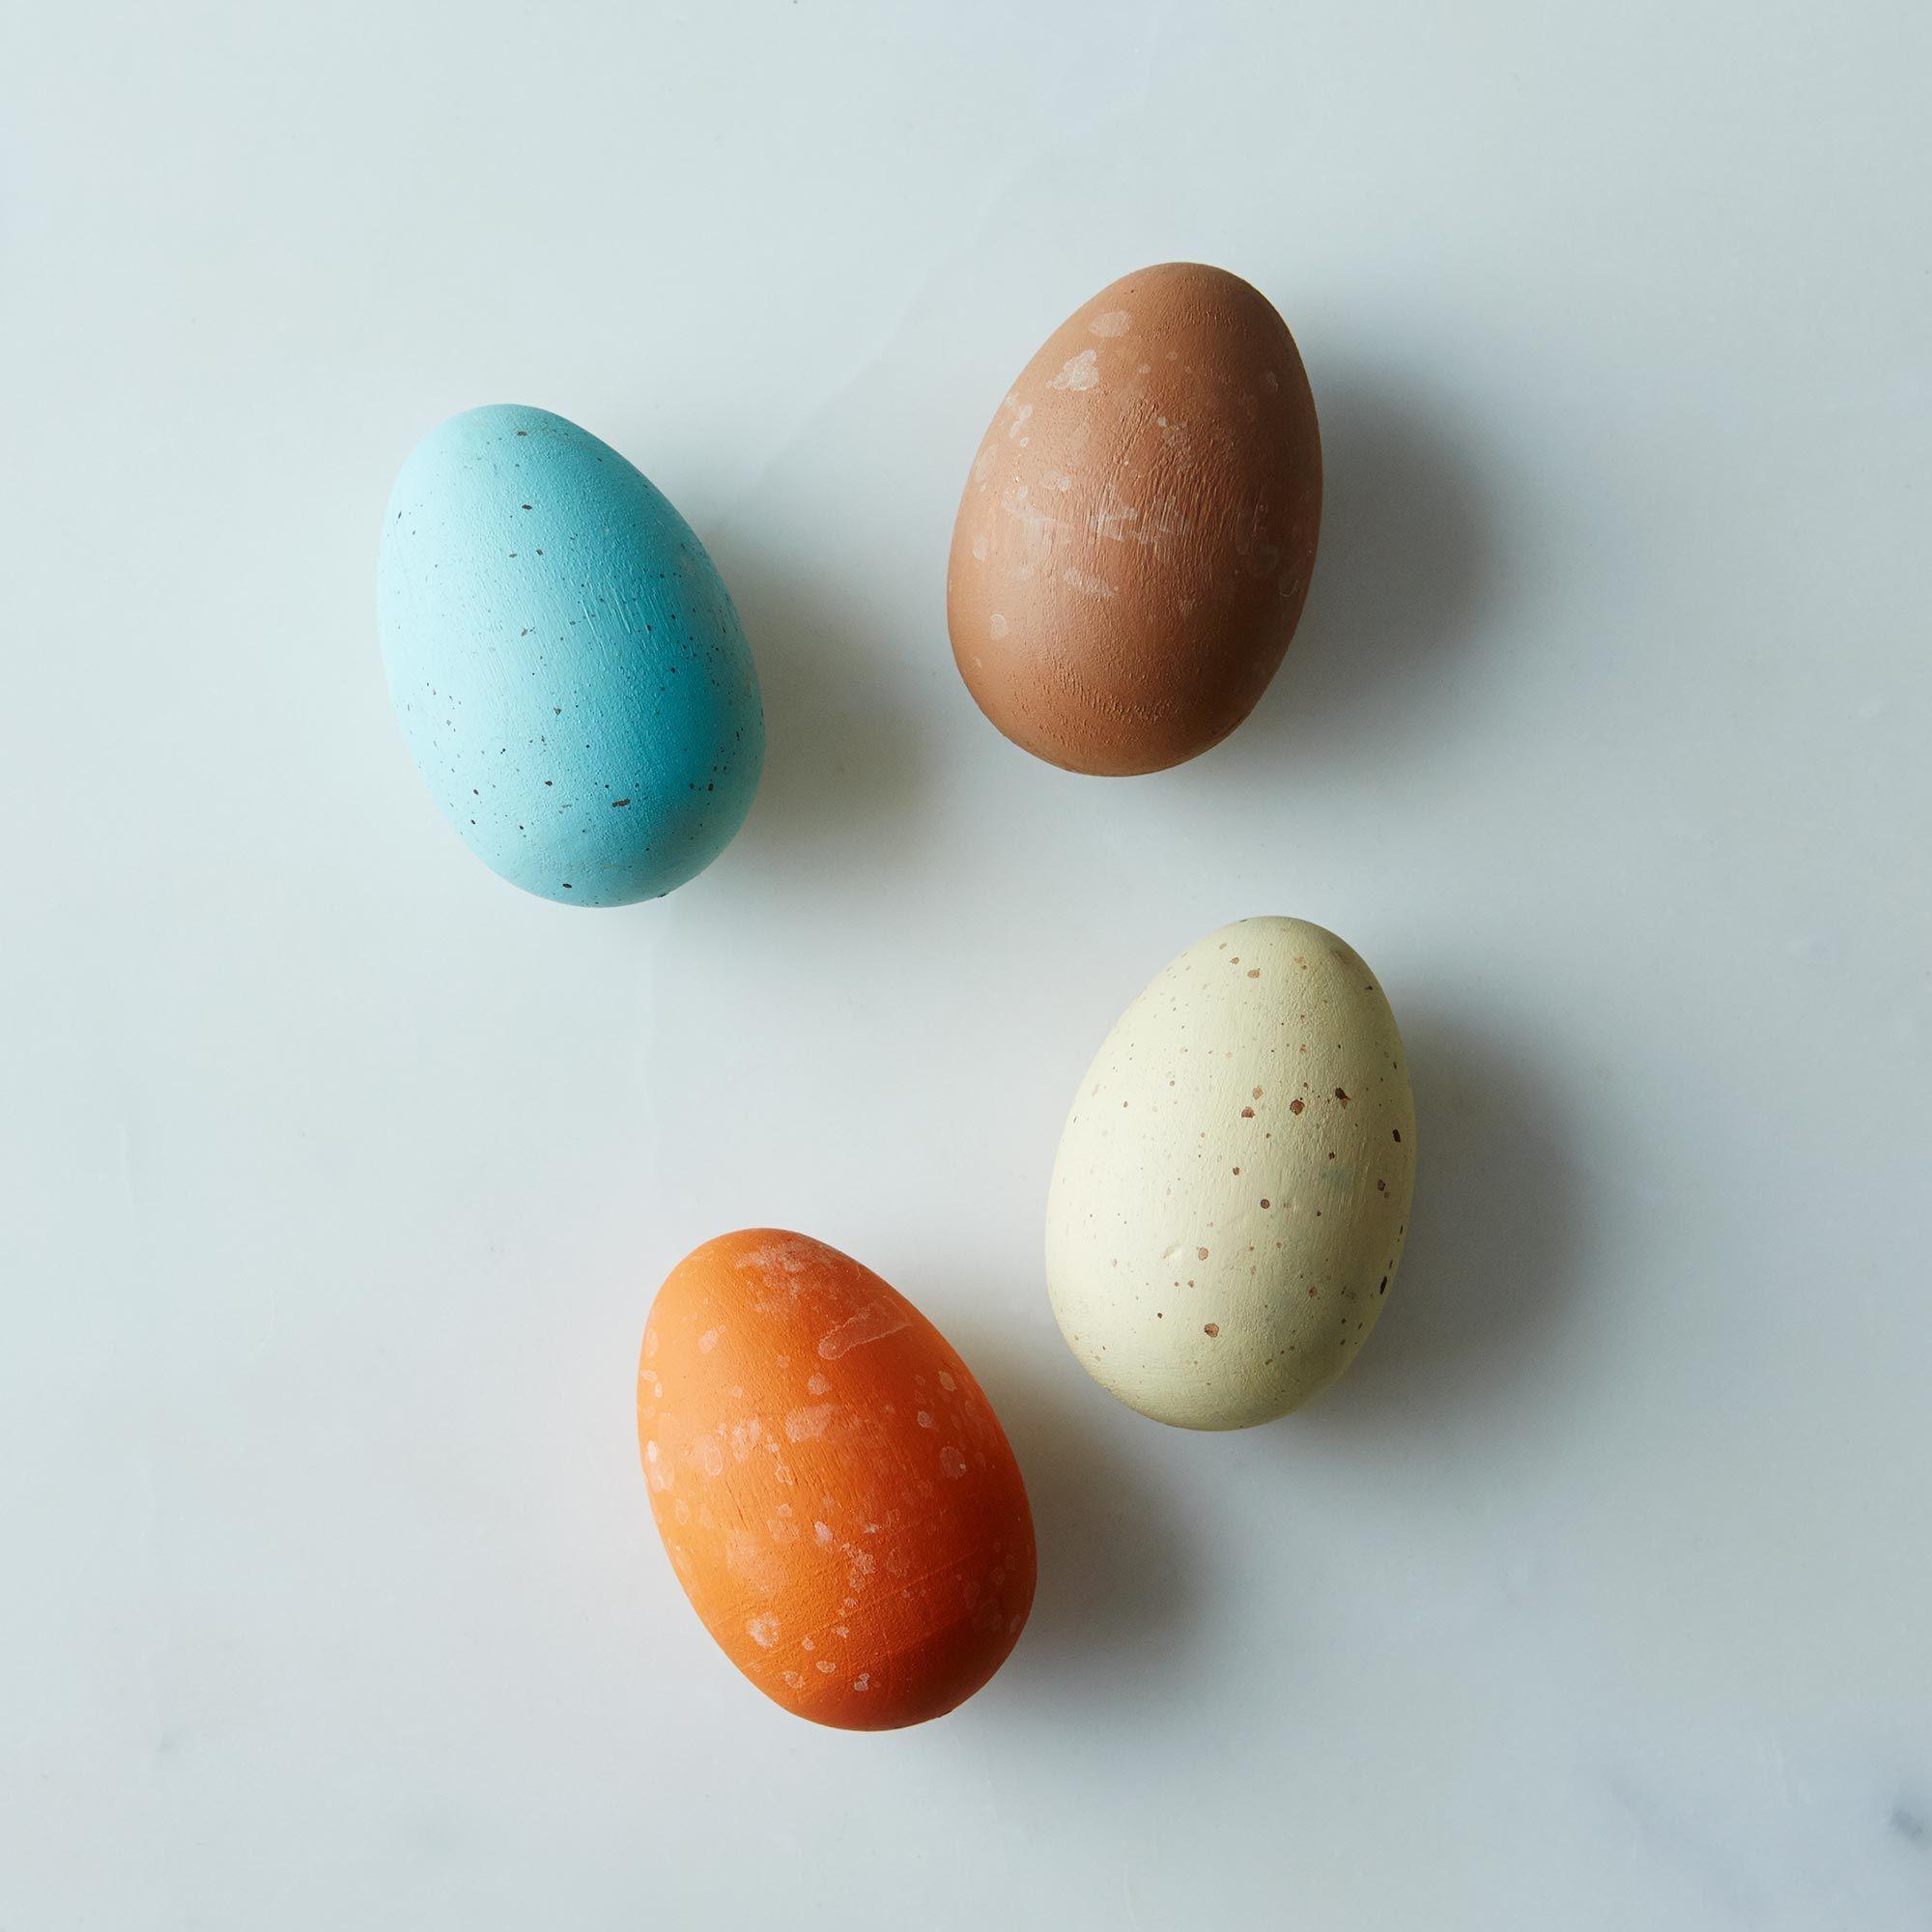 B5ec3025 c454 409e aa4a 36fb18890af4  cake in the mom wooden heritage egg toys provisions mark weinberg 06 11 14 0881 silo